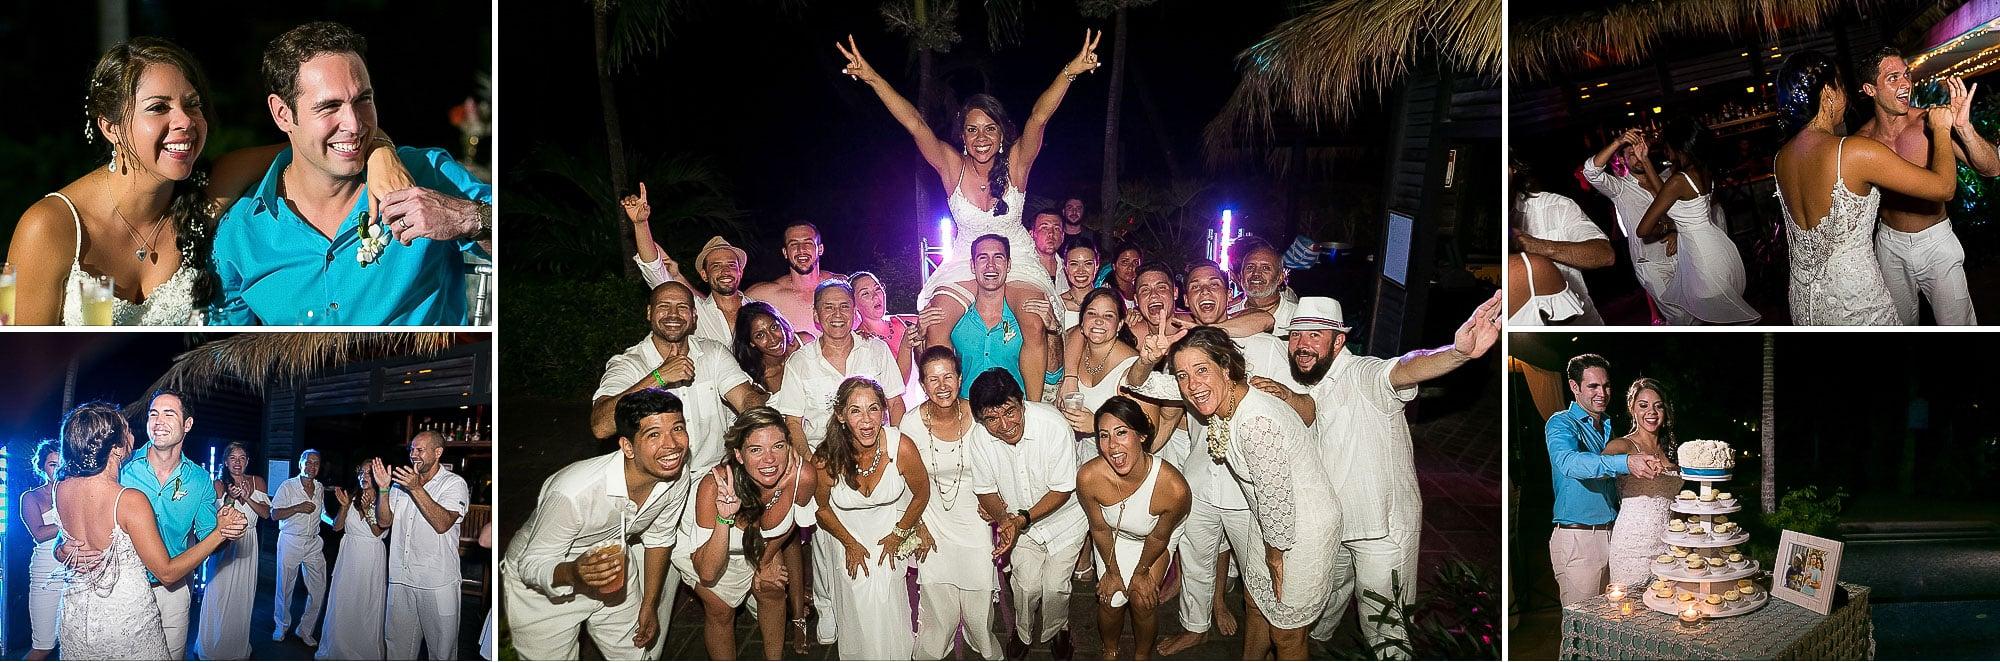 langosta beach wedding reception